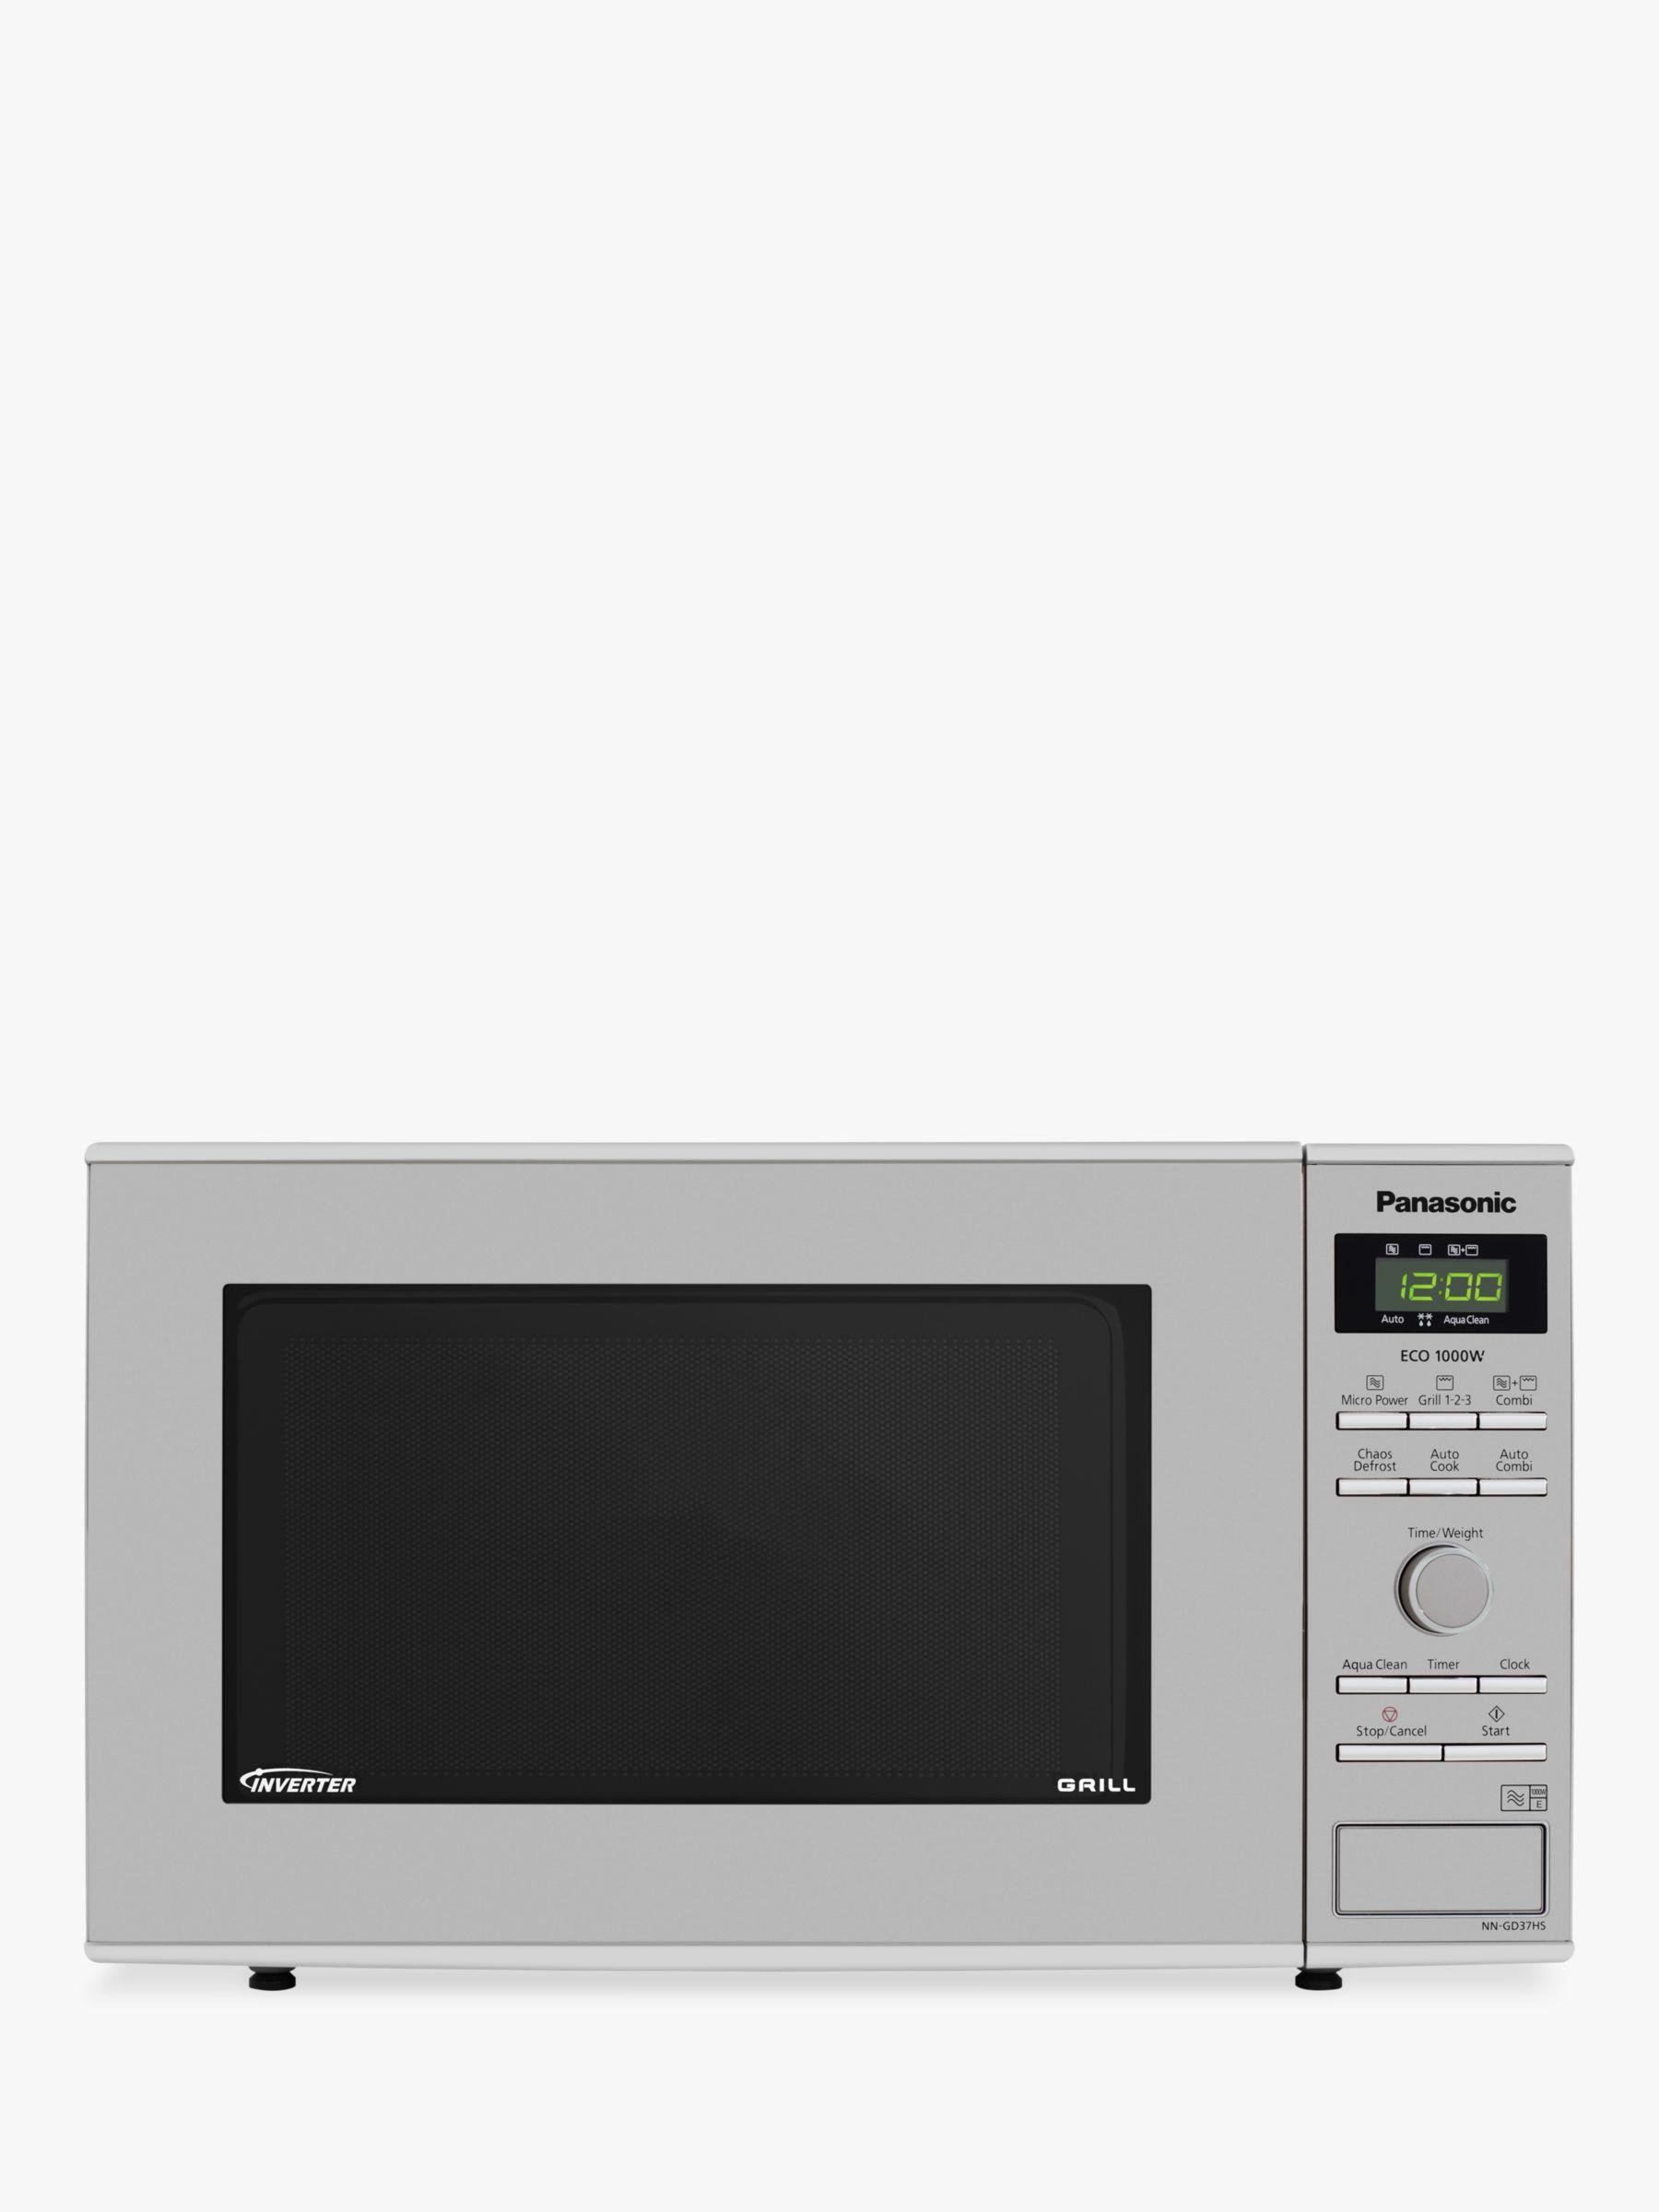 Panasonic Panasonic NN-GD37HSBPQ Freestanding Microwave with Grill, Stainless Steel